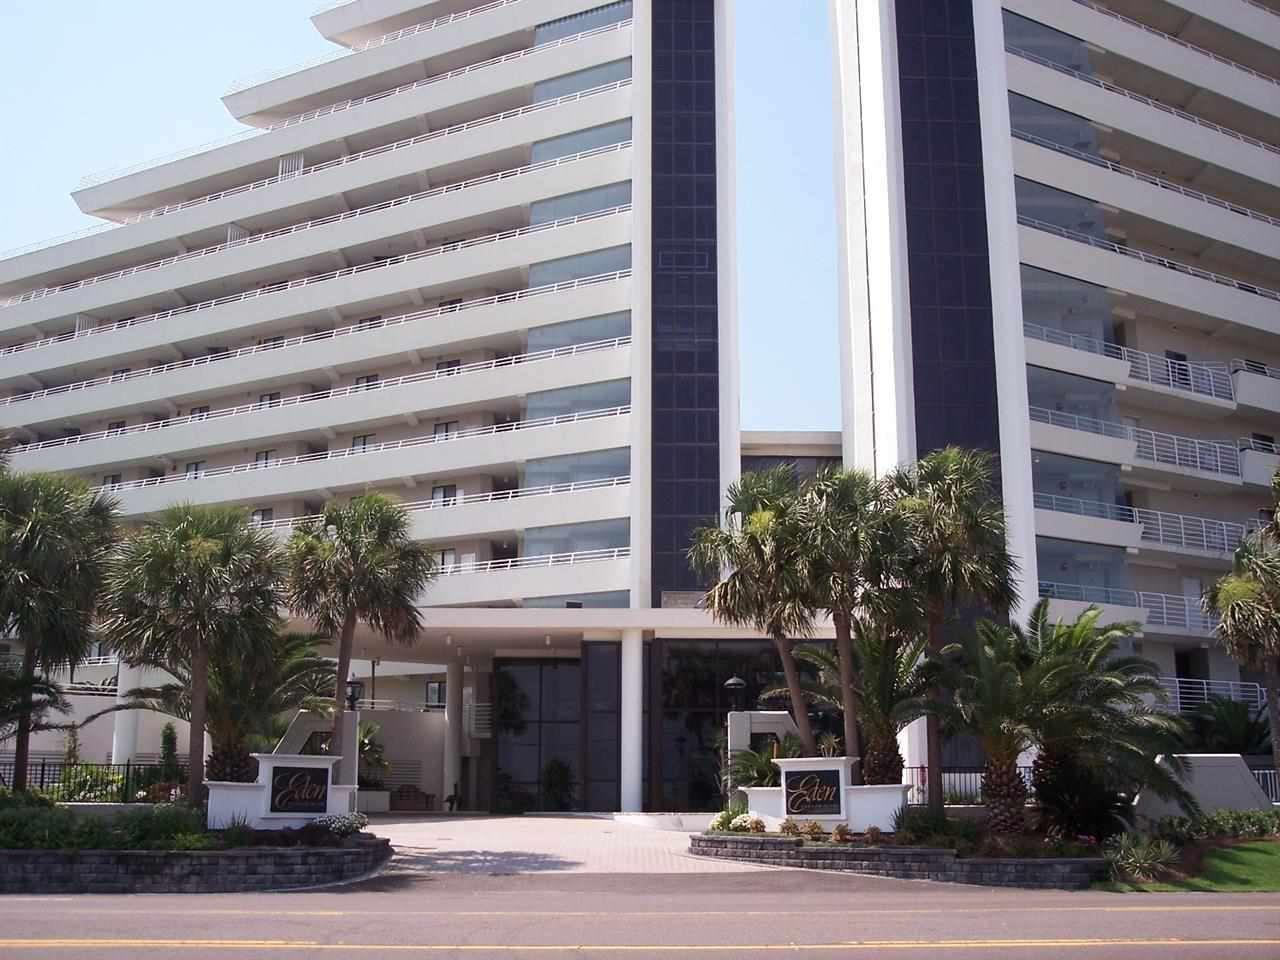 16281 PERDIDO KEY DR, PENSACOLA, FL 32507